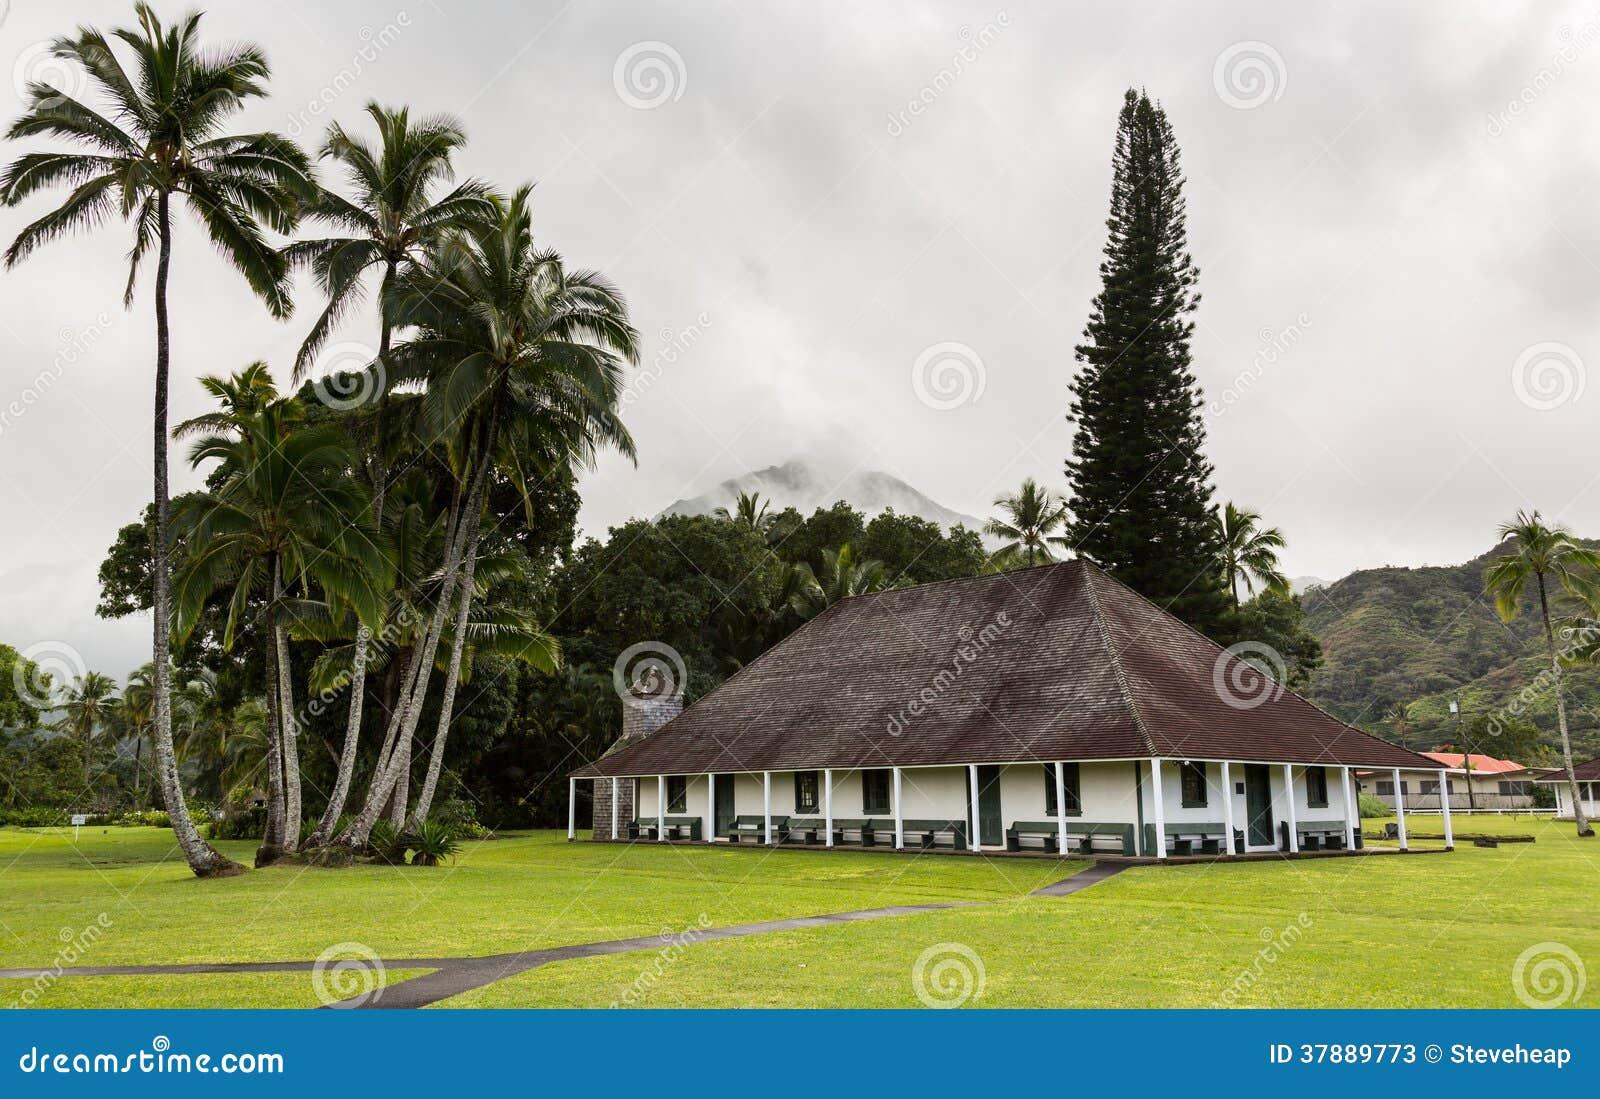 De Opdrachtzaal van Waiolihuiia in Hanalei Kauai